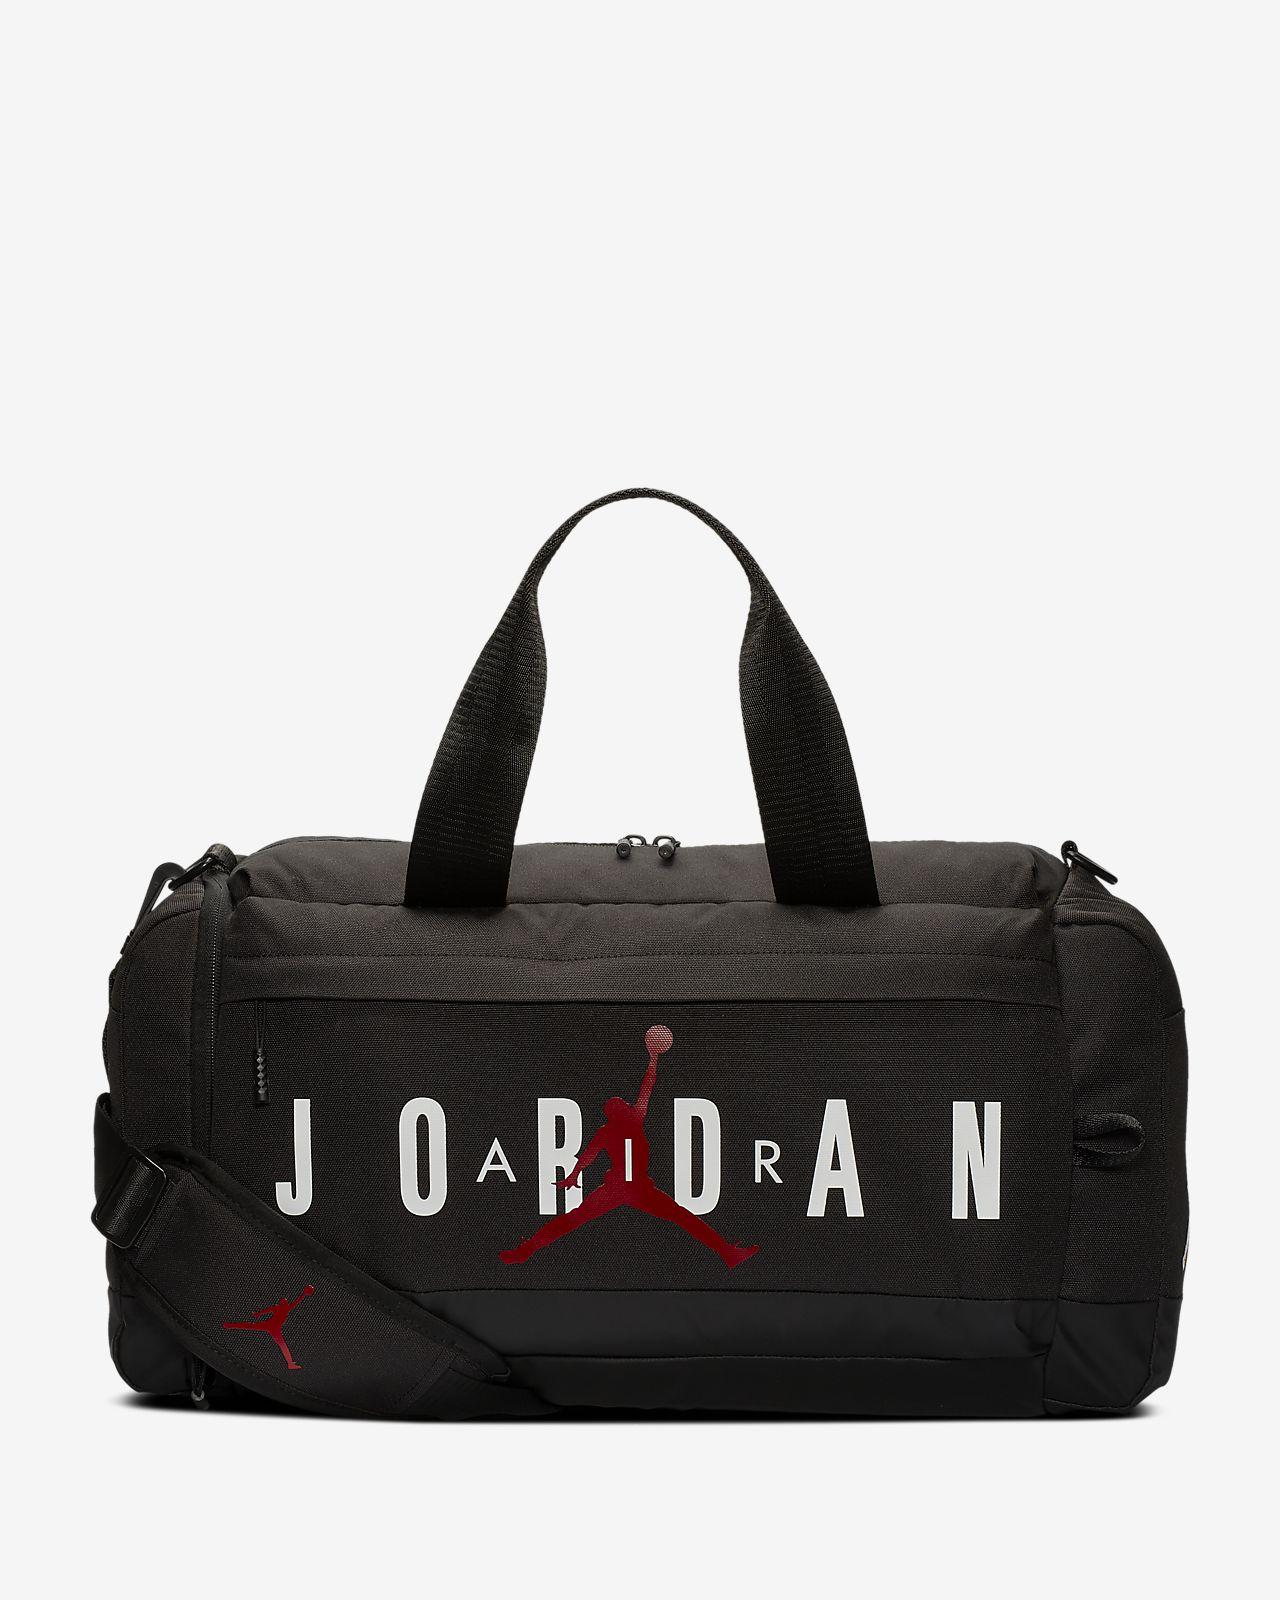 Jordan Duffel Bag (Large)